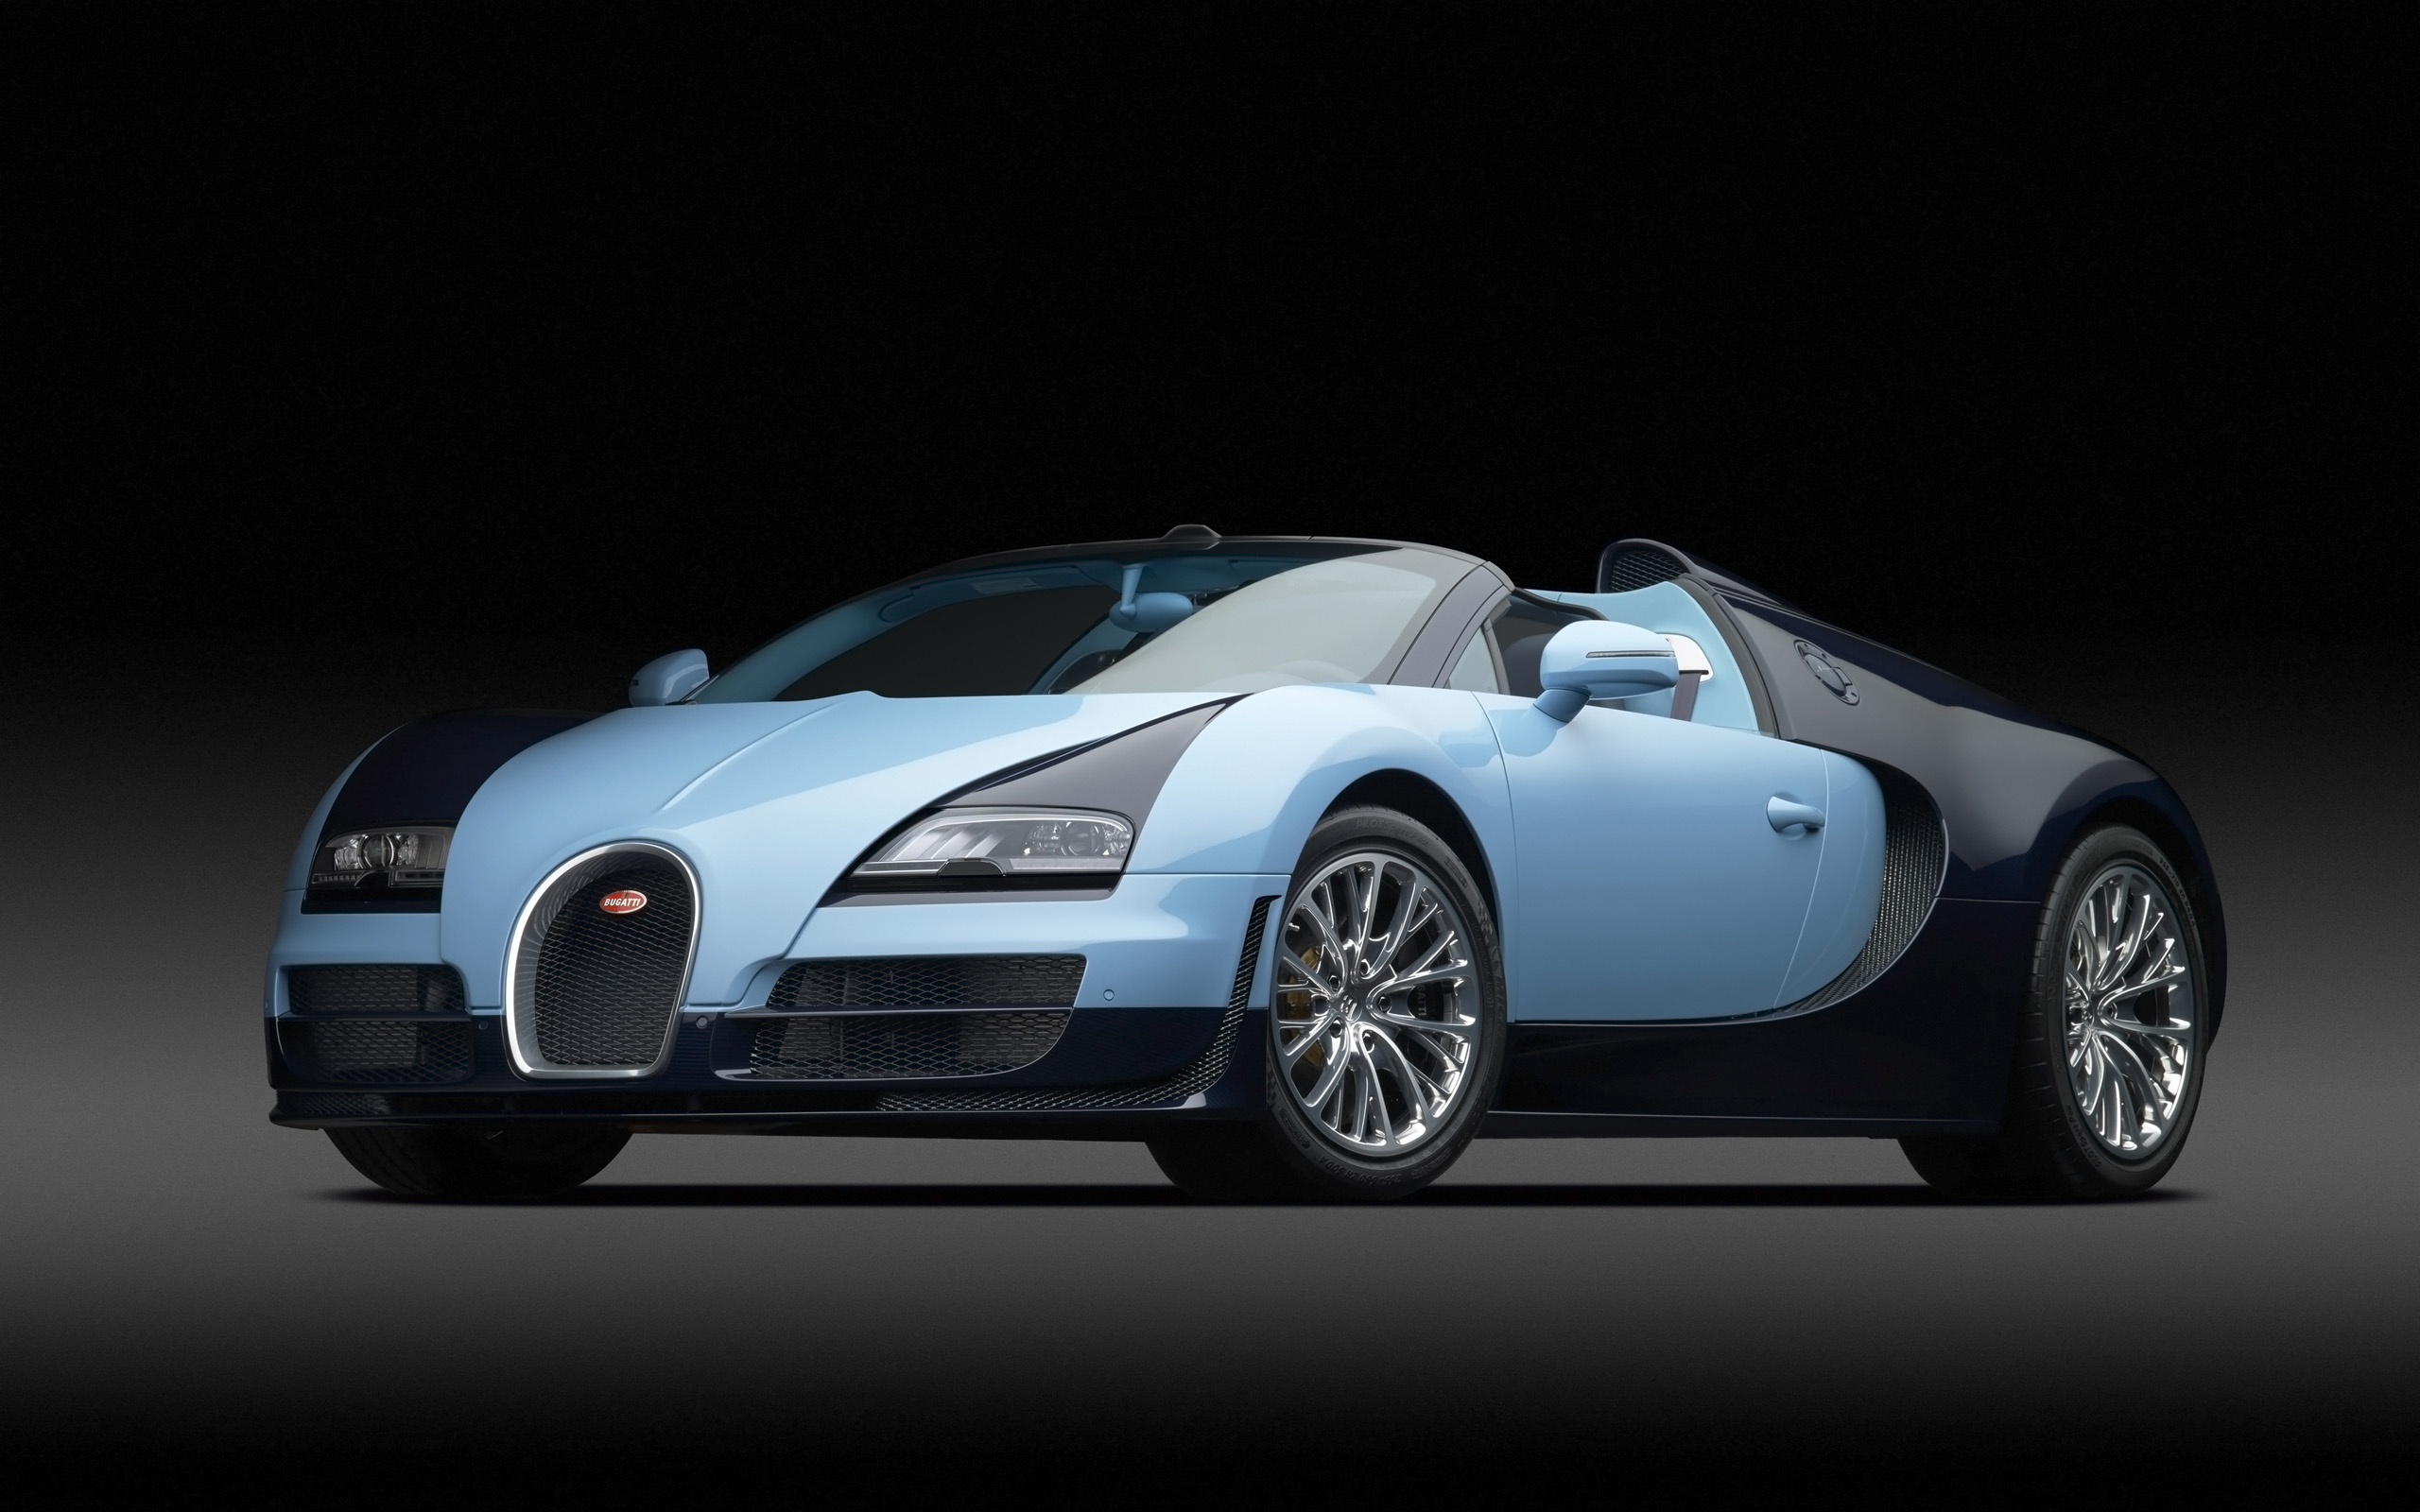 bugatti veyron grand sport vitesse legend jean pierre wimille 2013 wallpaper hd car wallpapers. Black Bedroom Furniture Sets. Home Design Ideas